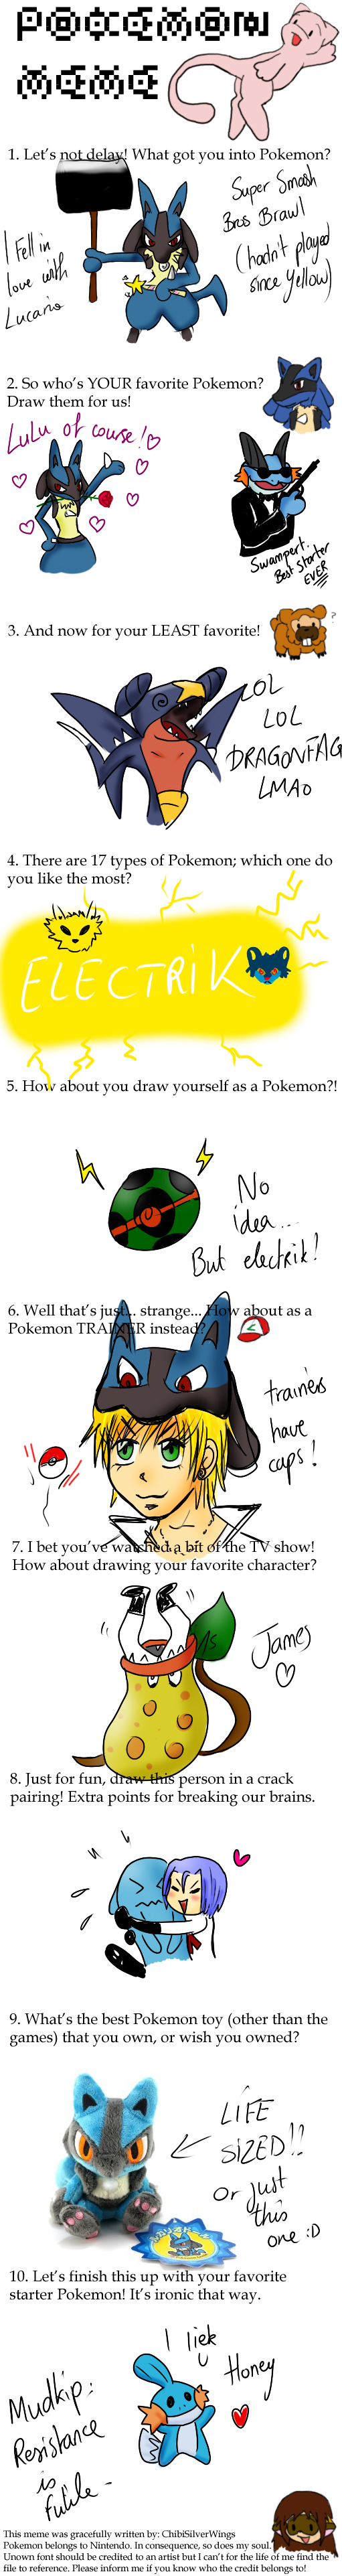 Pokémon Gotta Free 'em all ! Pokemon_meme_by_muramoko-d3c64hf